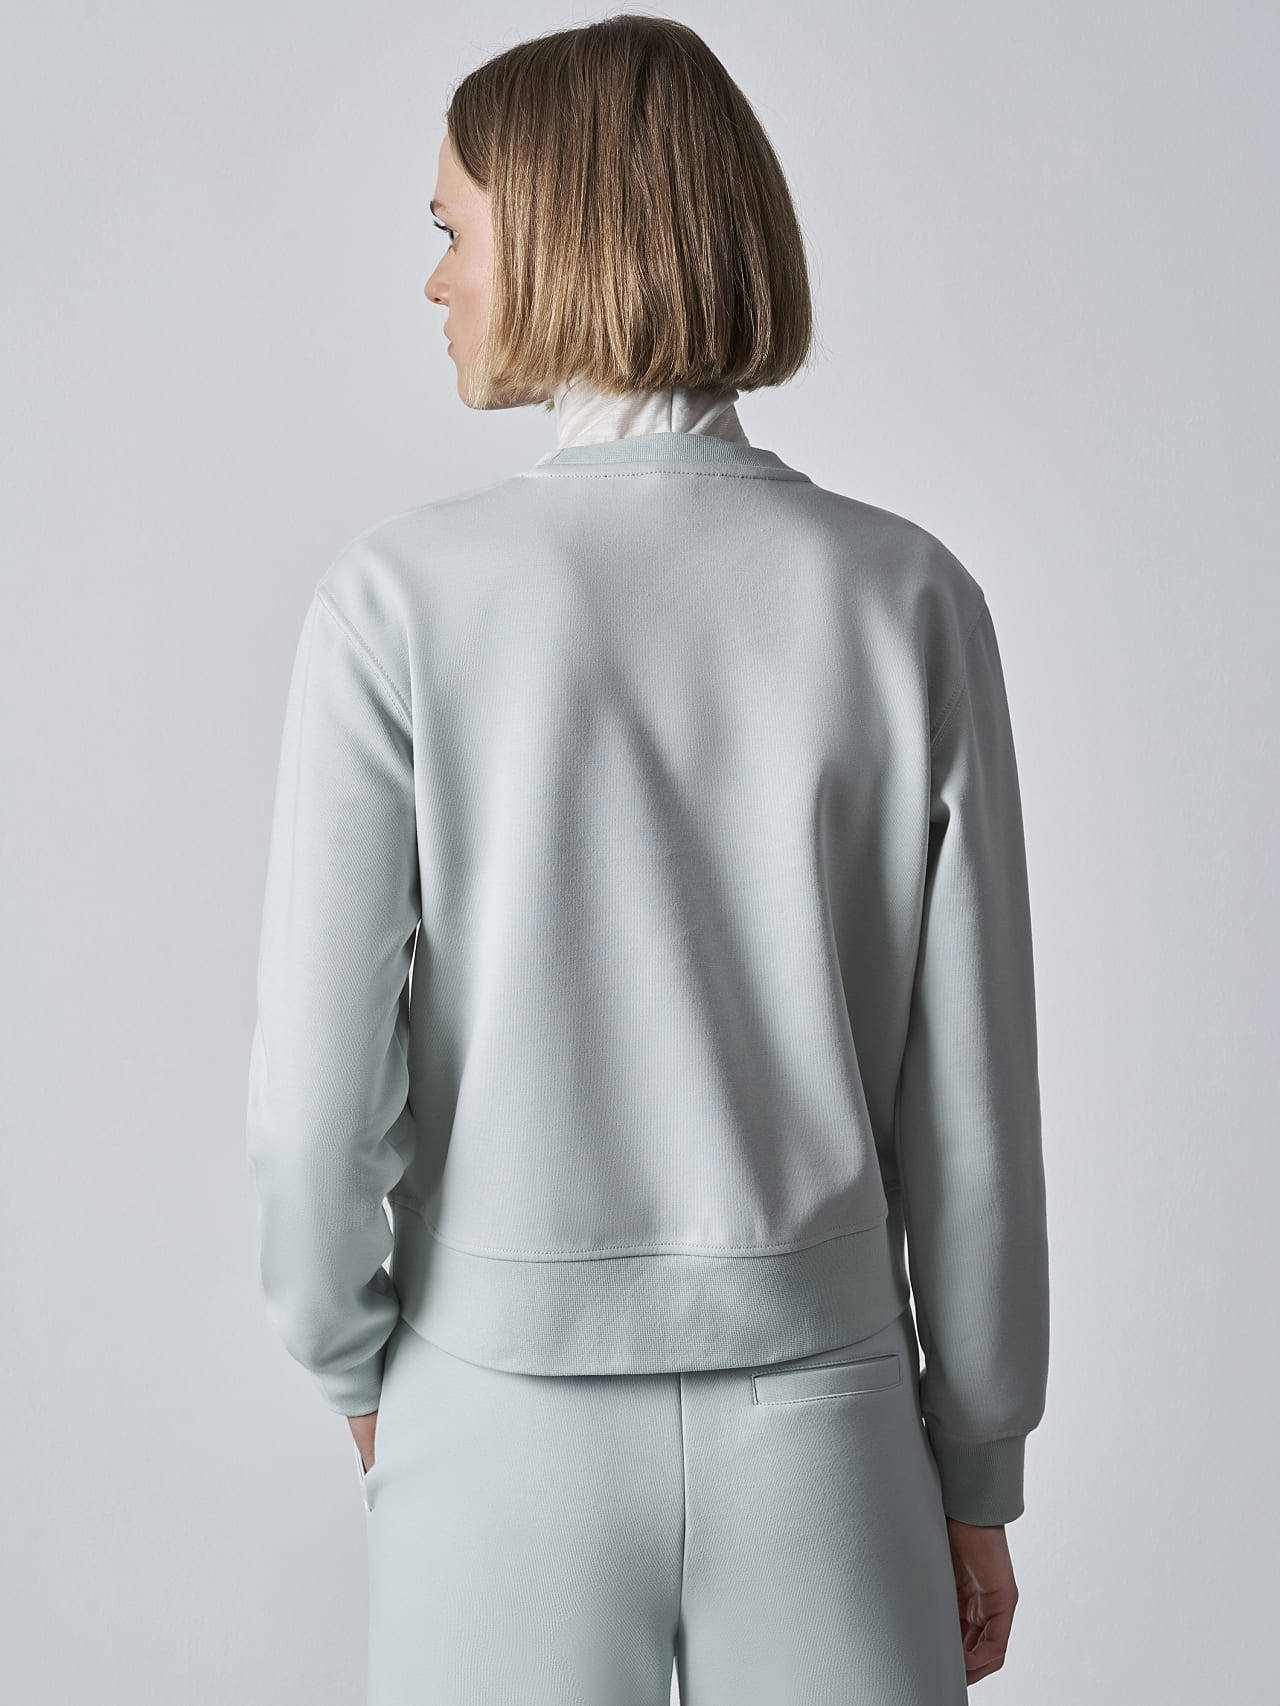 SHINT V1.Y5.02 Premium Logo Sweater Pale Blue  Front Main Alpha Tauri